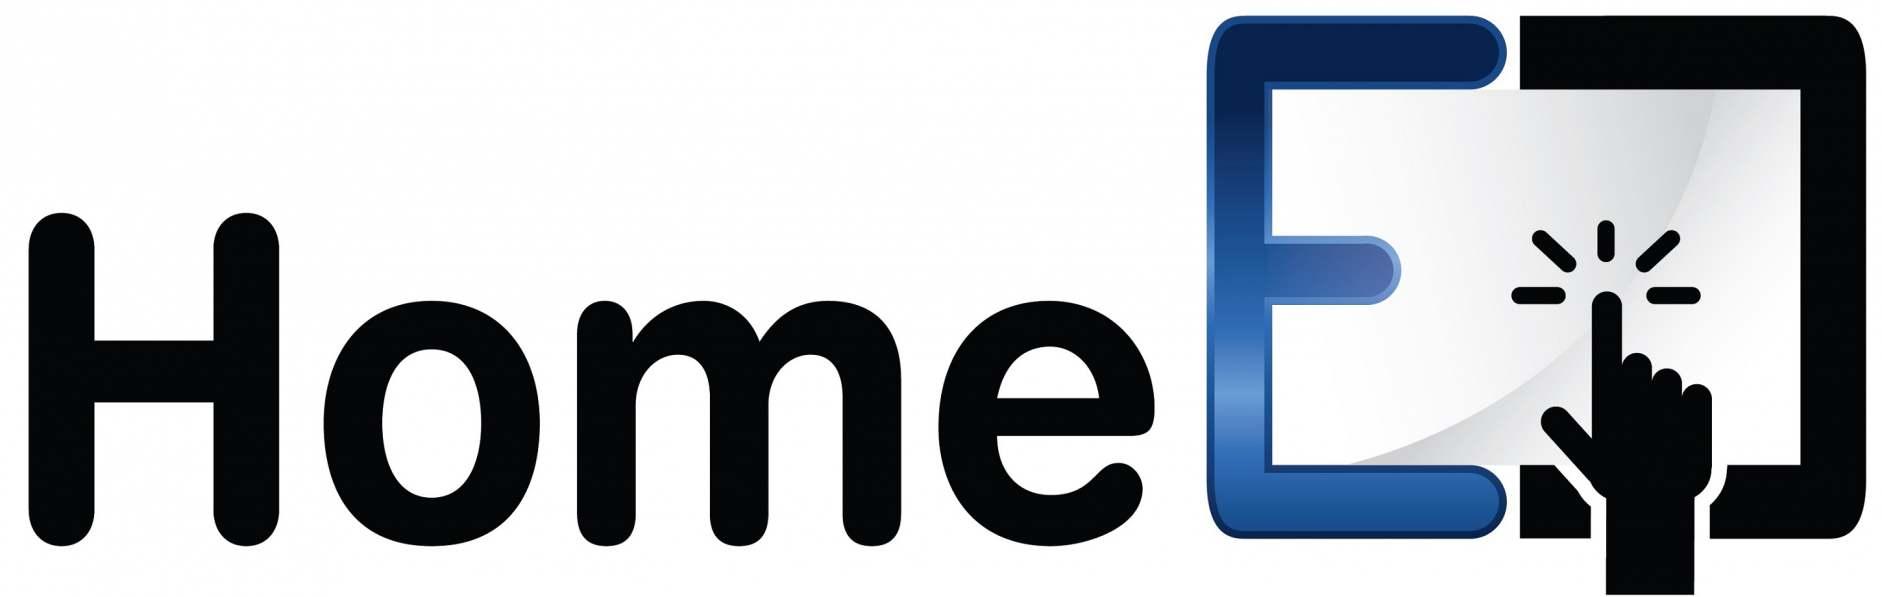 Hum Tum, Inc. Logo